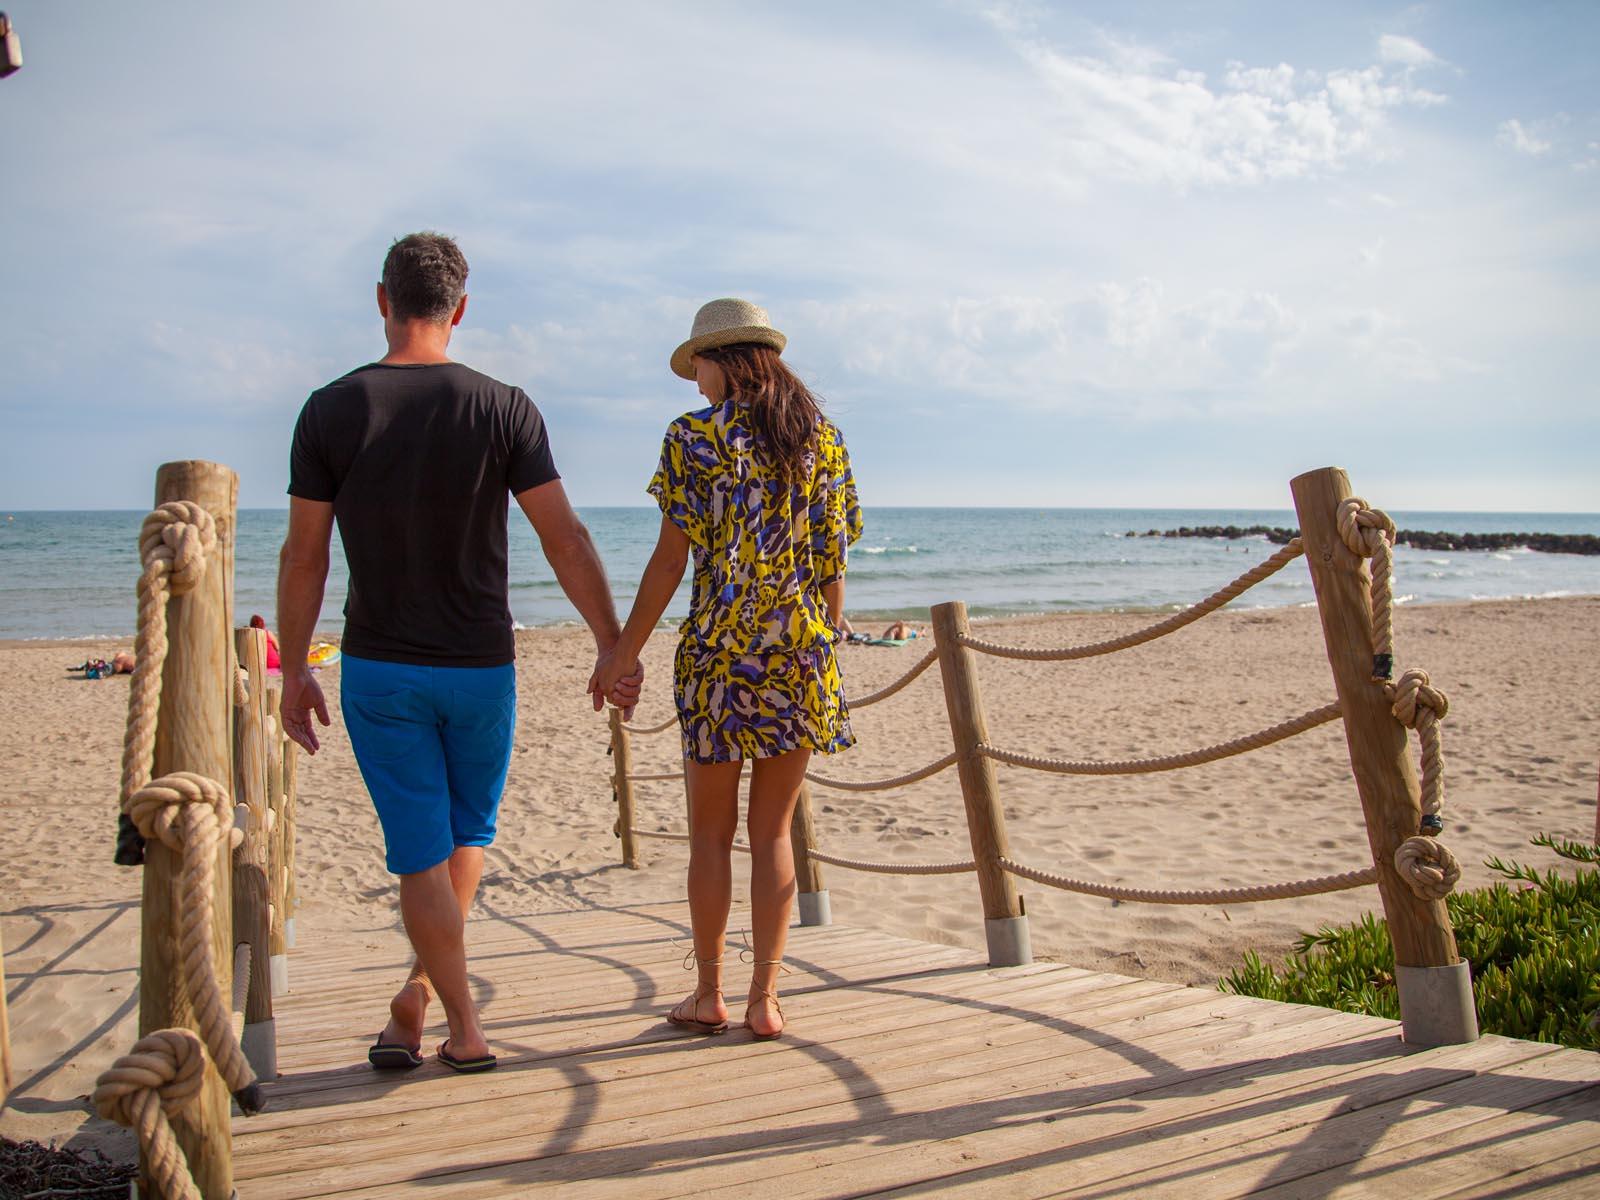 Couple Vias plage